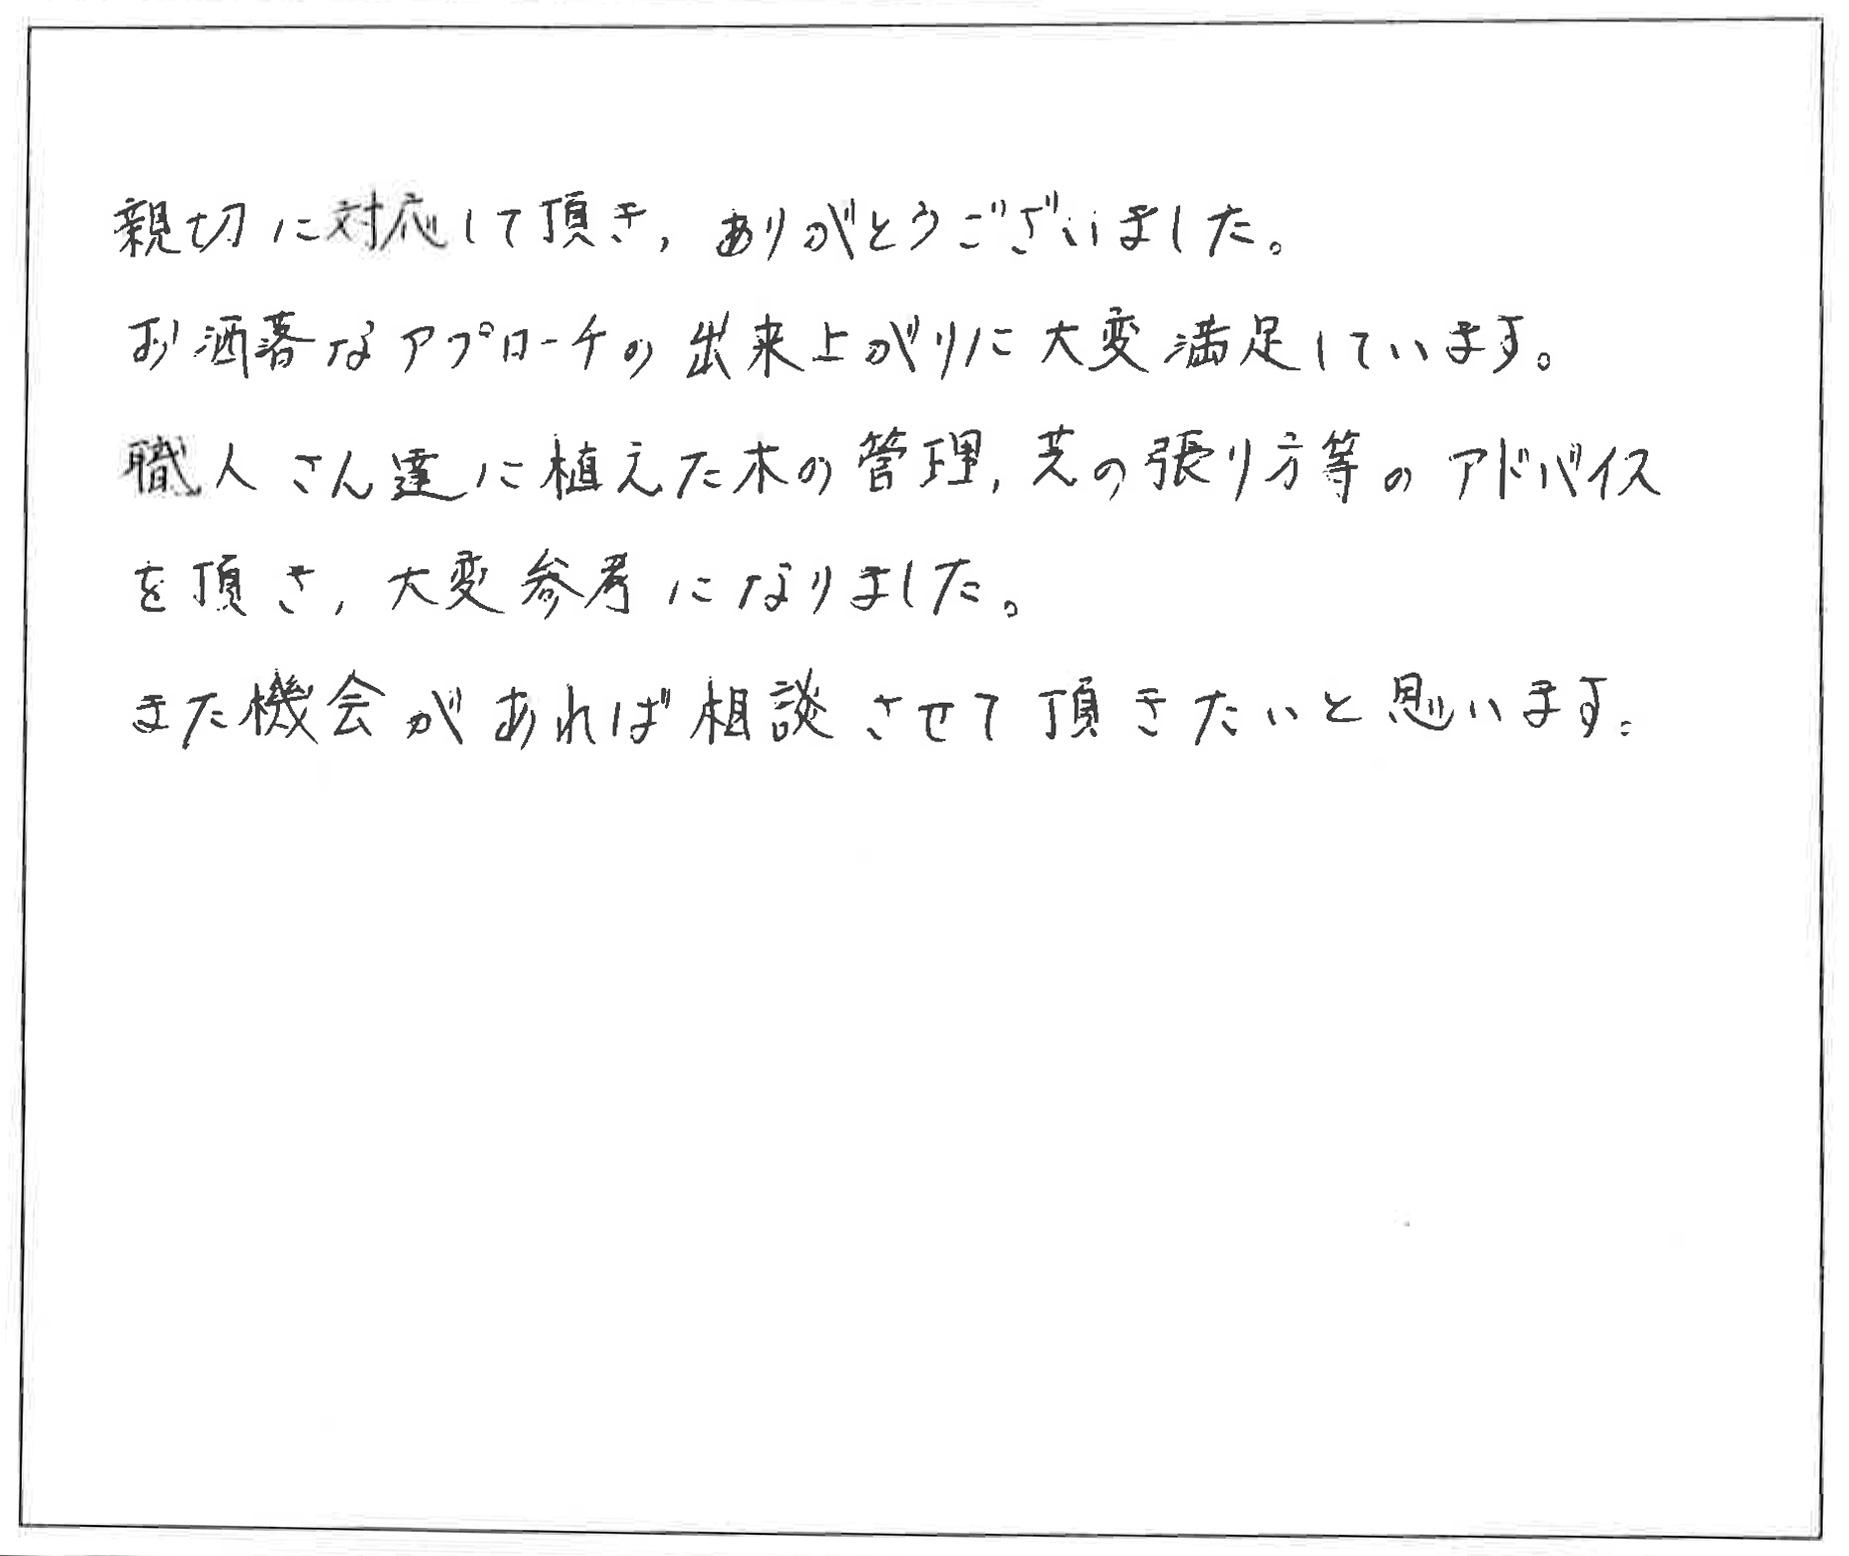 松川村 K様の声